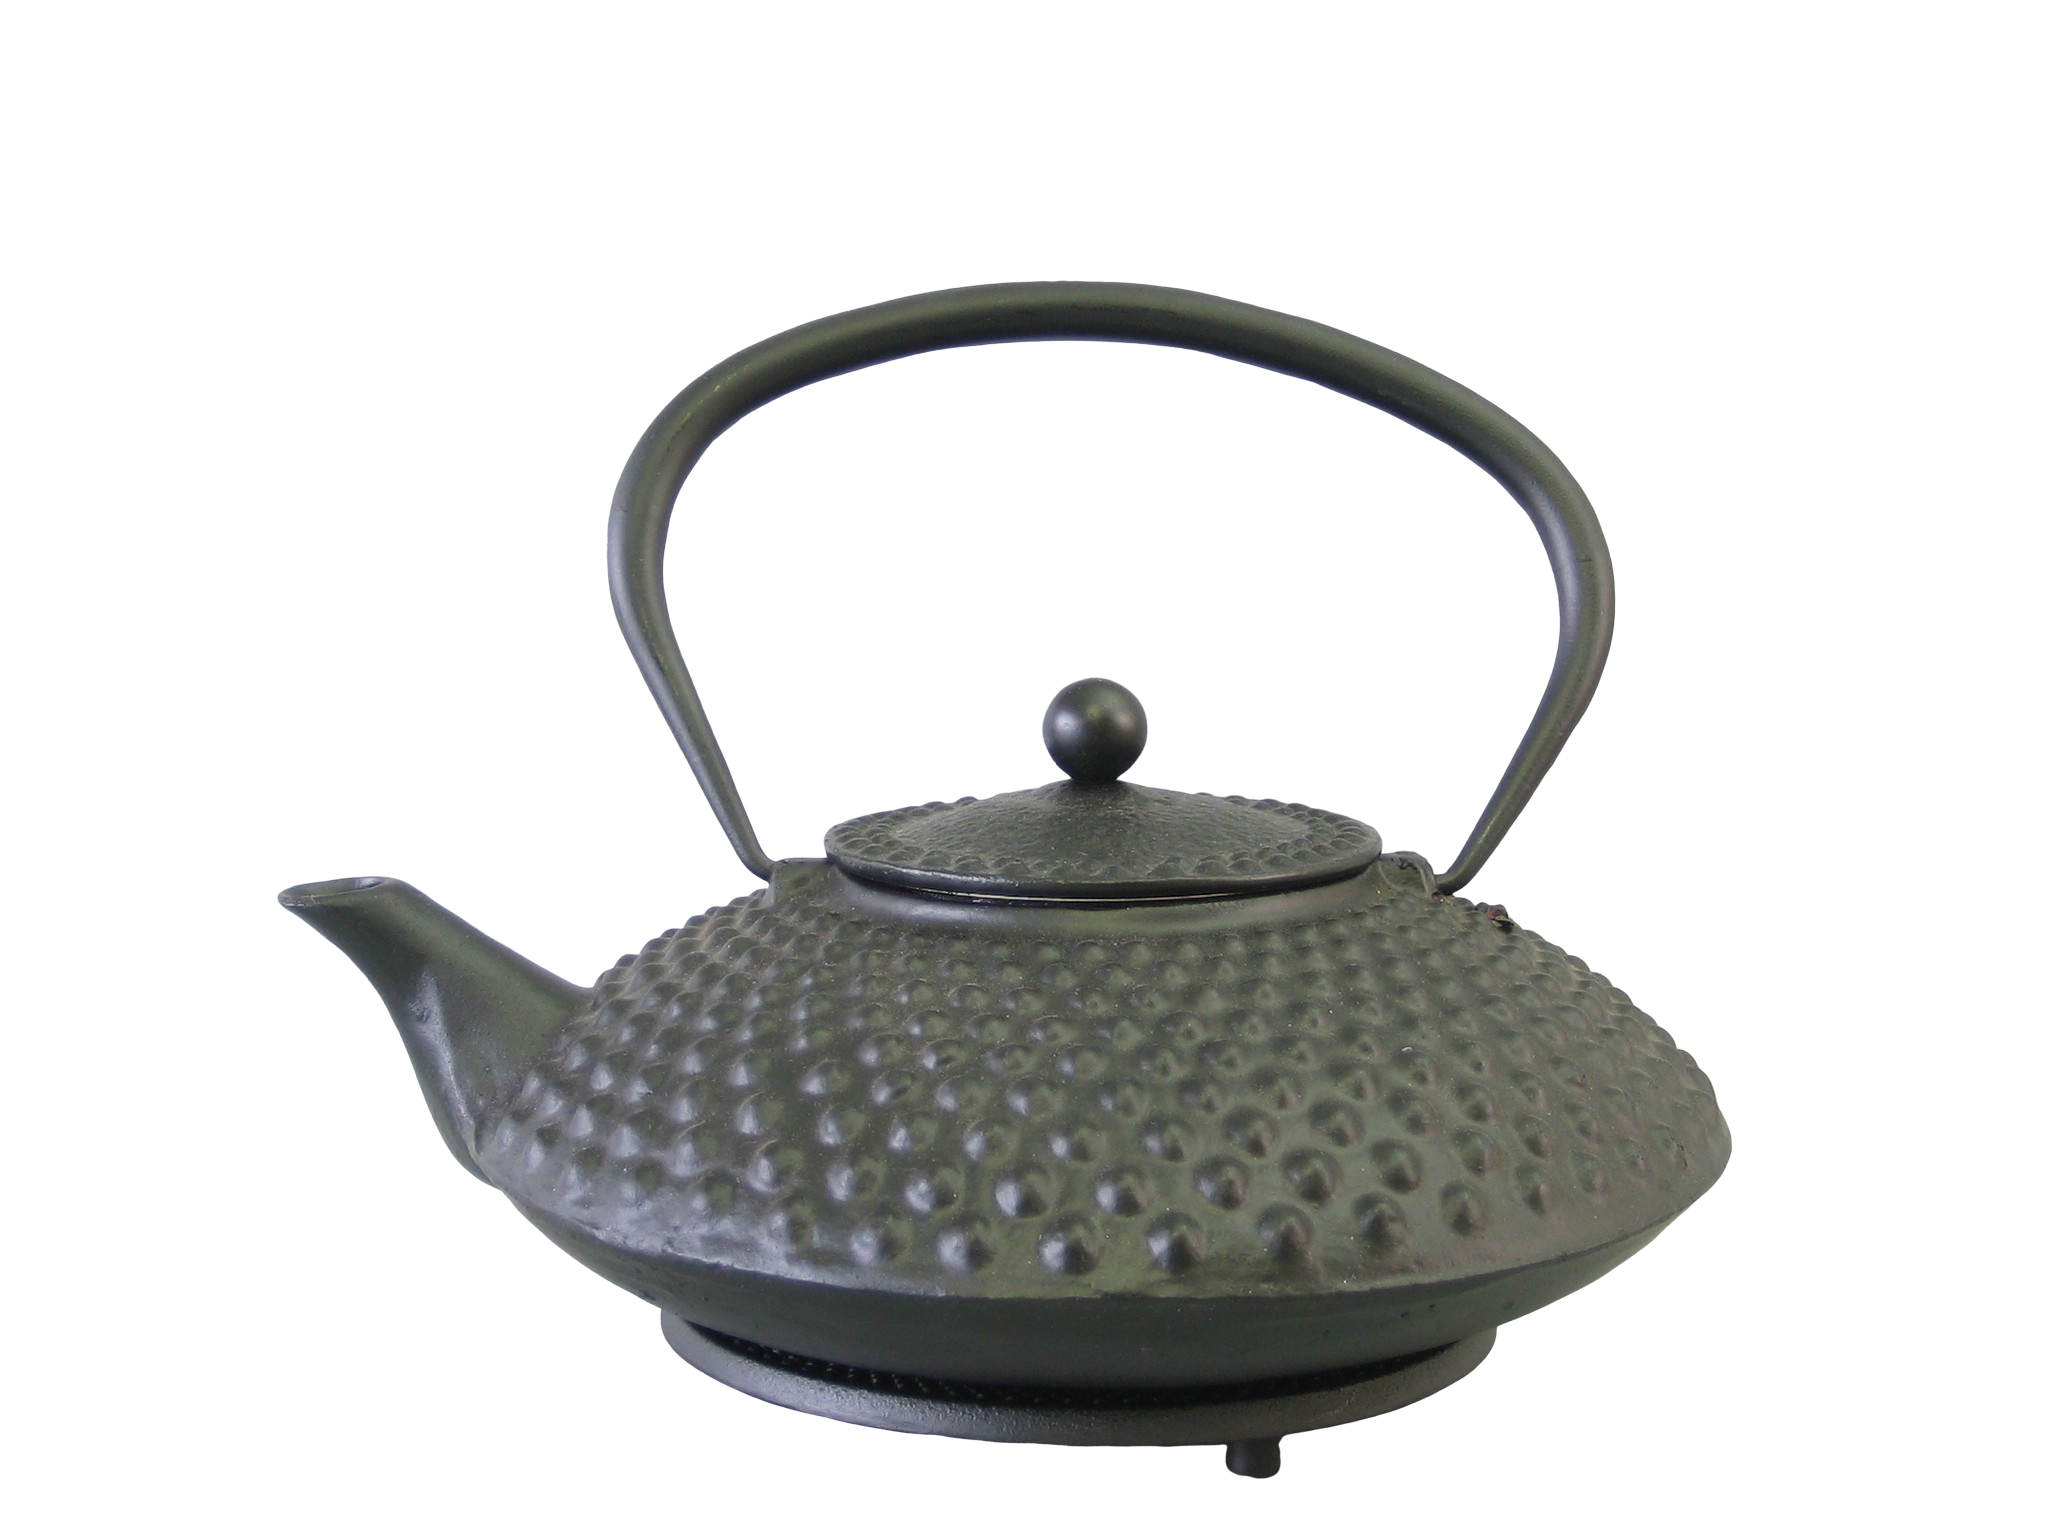 HIRA125 - Cast iron teapot enameled interior 1.25 L - Green Leaf